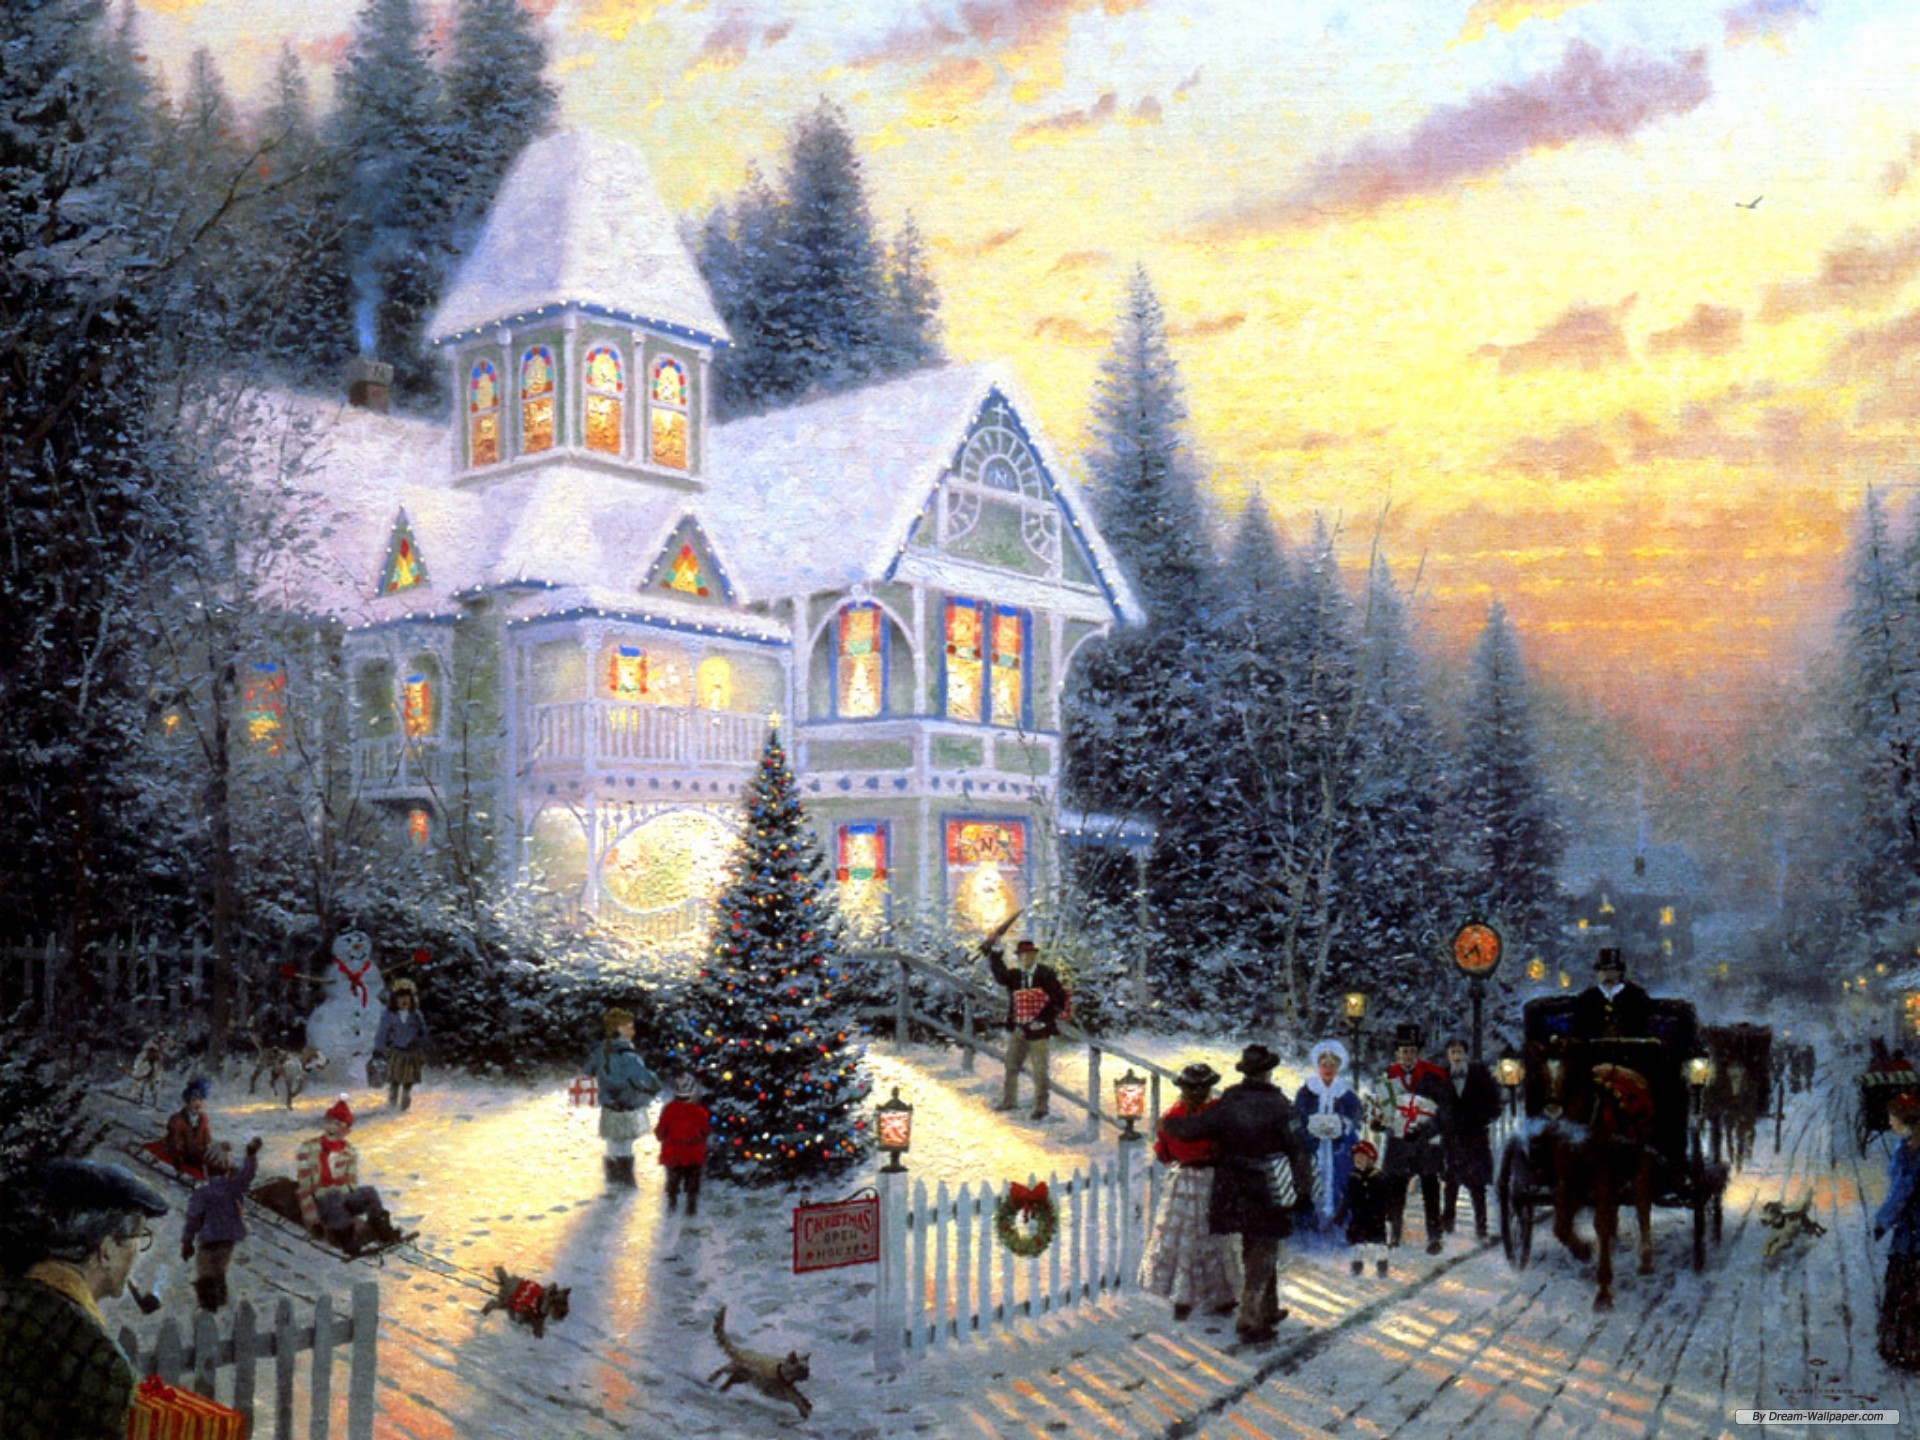 dream wallpapercomholiday wallpaperchristmas eve painting wallpaper 1920x1440